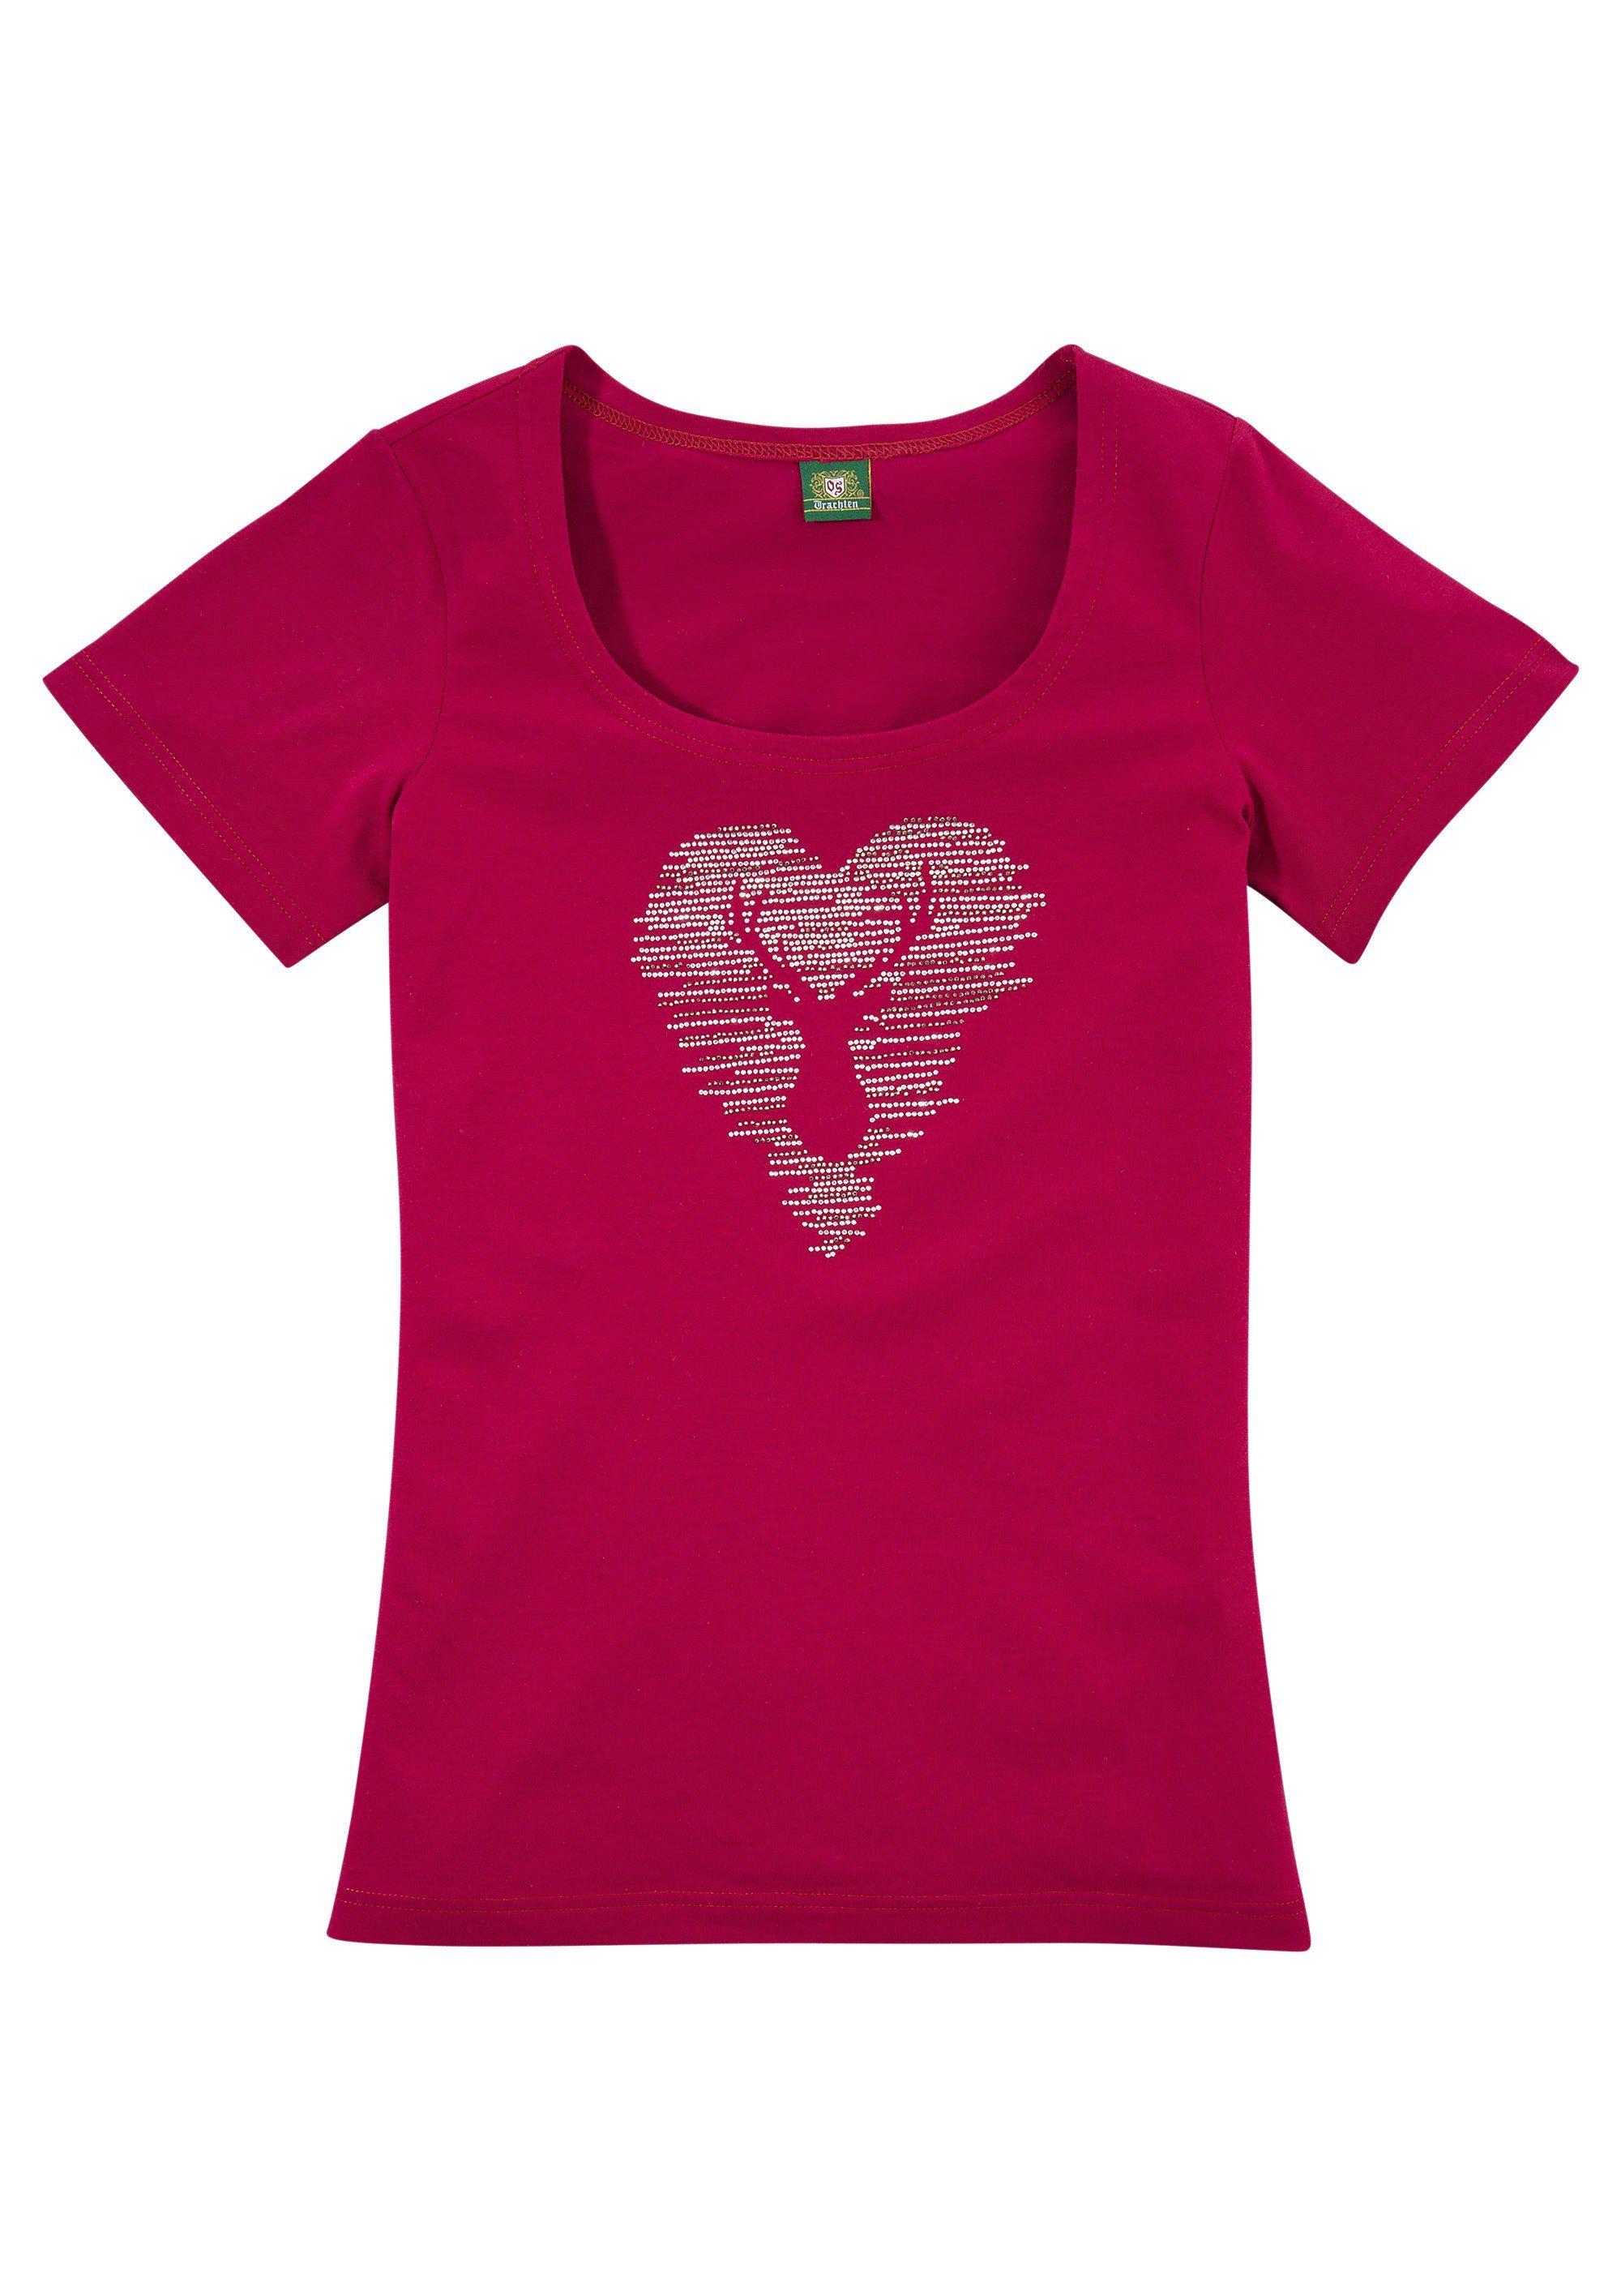 OS-Trachten Trachtenshirt mit Hirschmotiv Damenmode/Bekleidung/Trachtenmode/Trachtenshirts